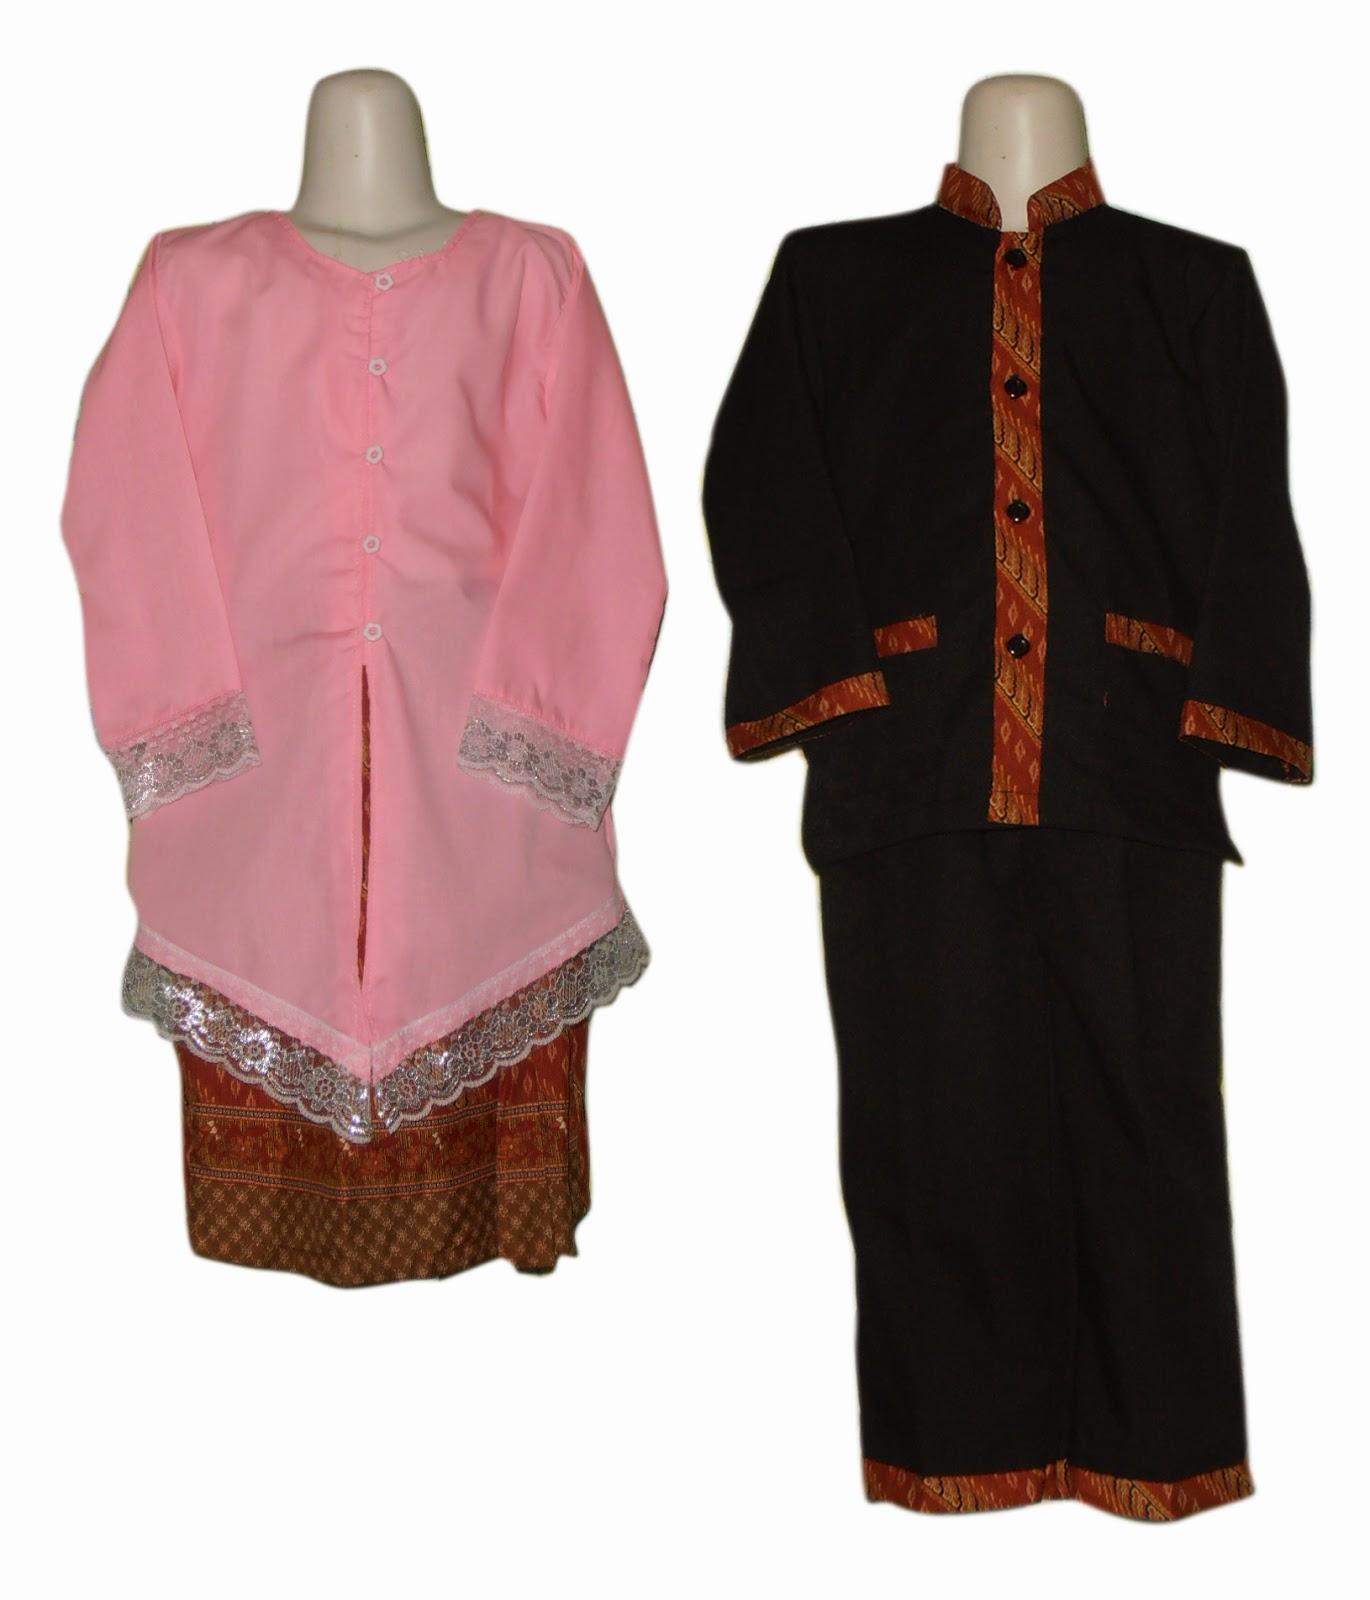 Ragam Pakaian Adat Jawa Barat yang Harus Kamu Tahu Ragam Pakaian Adat Jawa Barat yang Harus Kamu Tahu